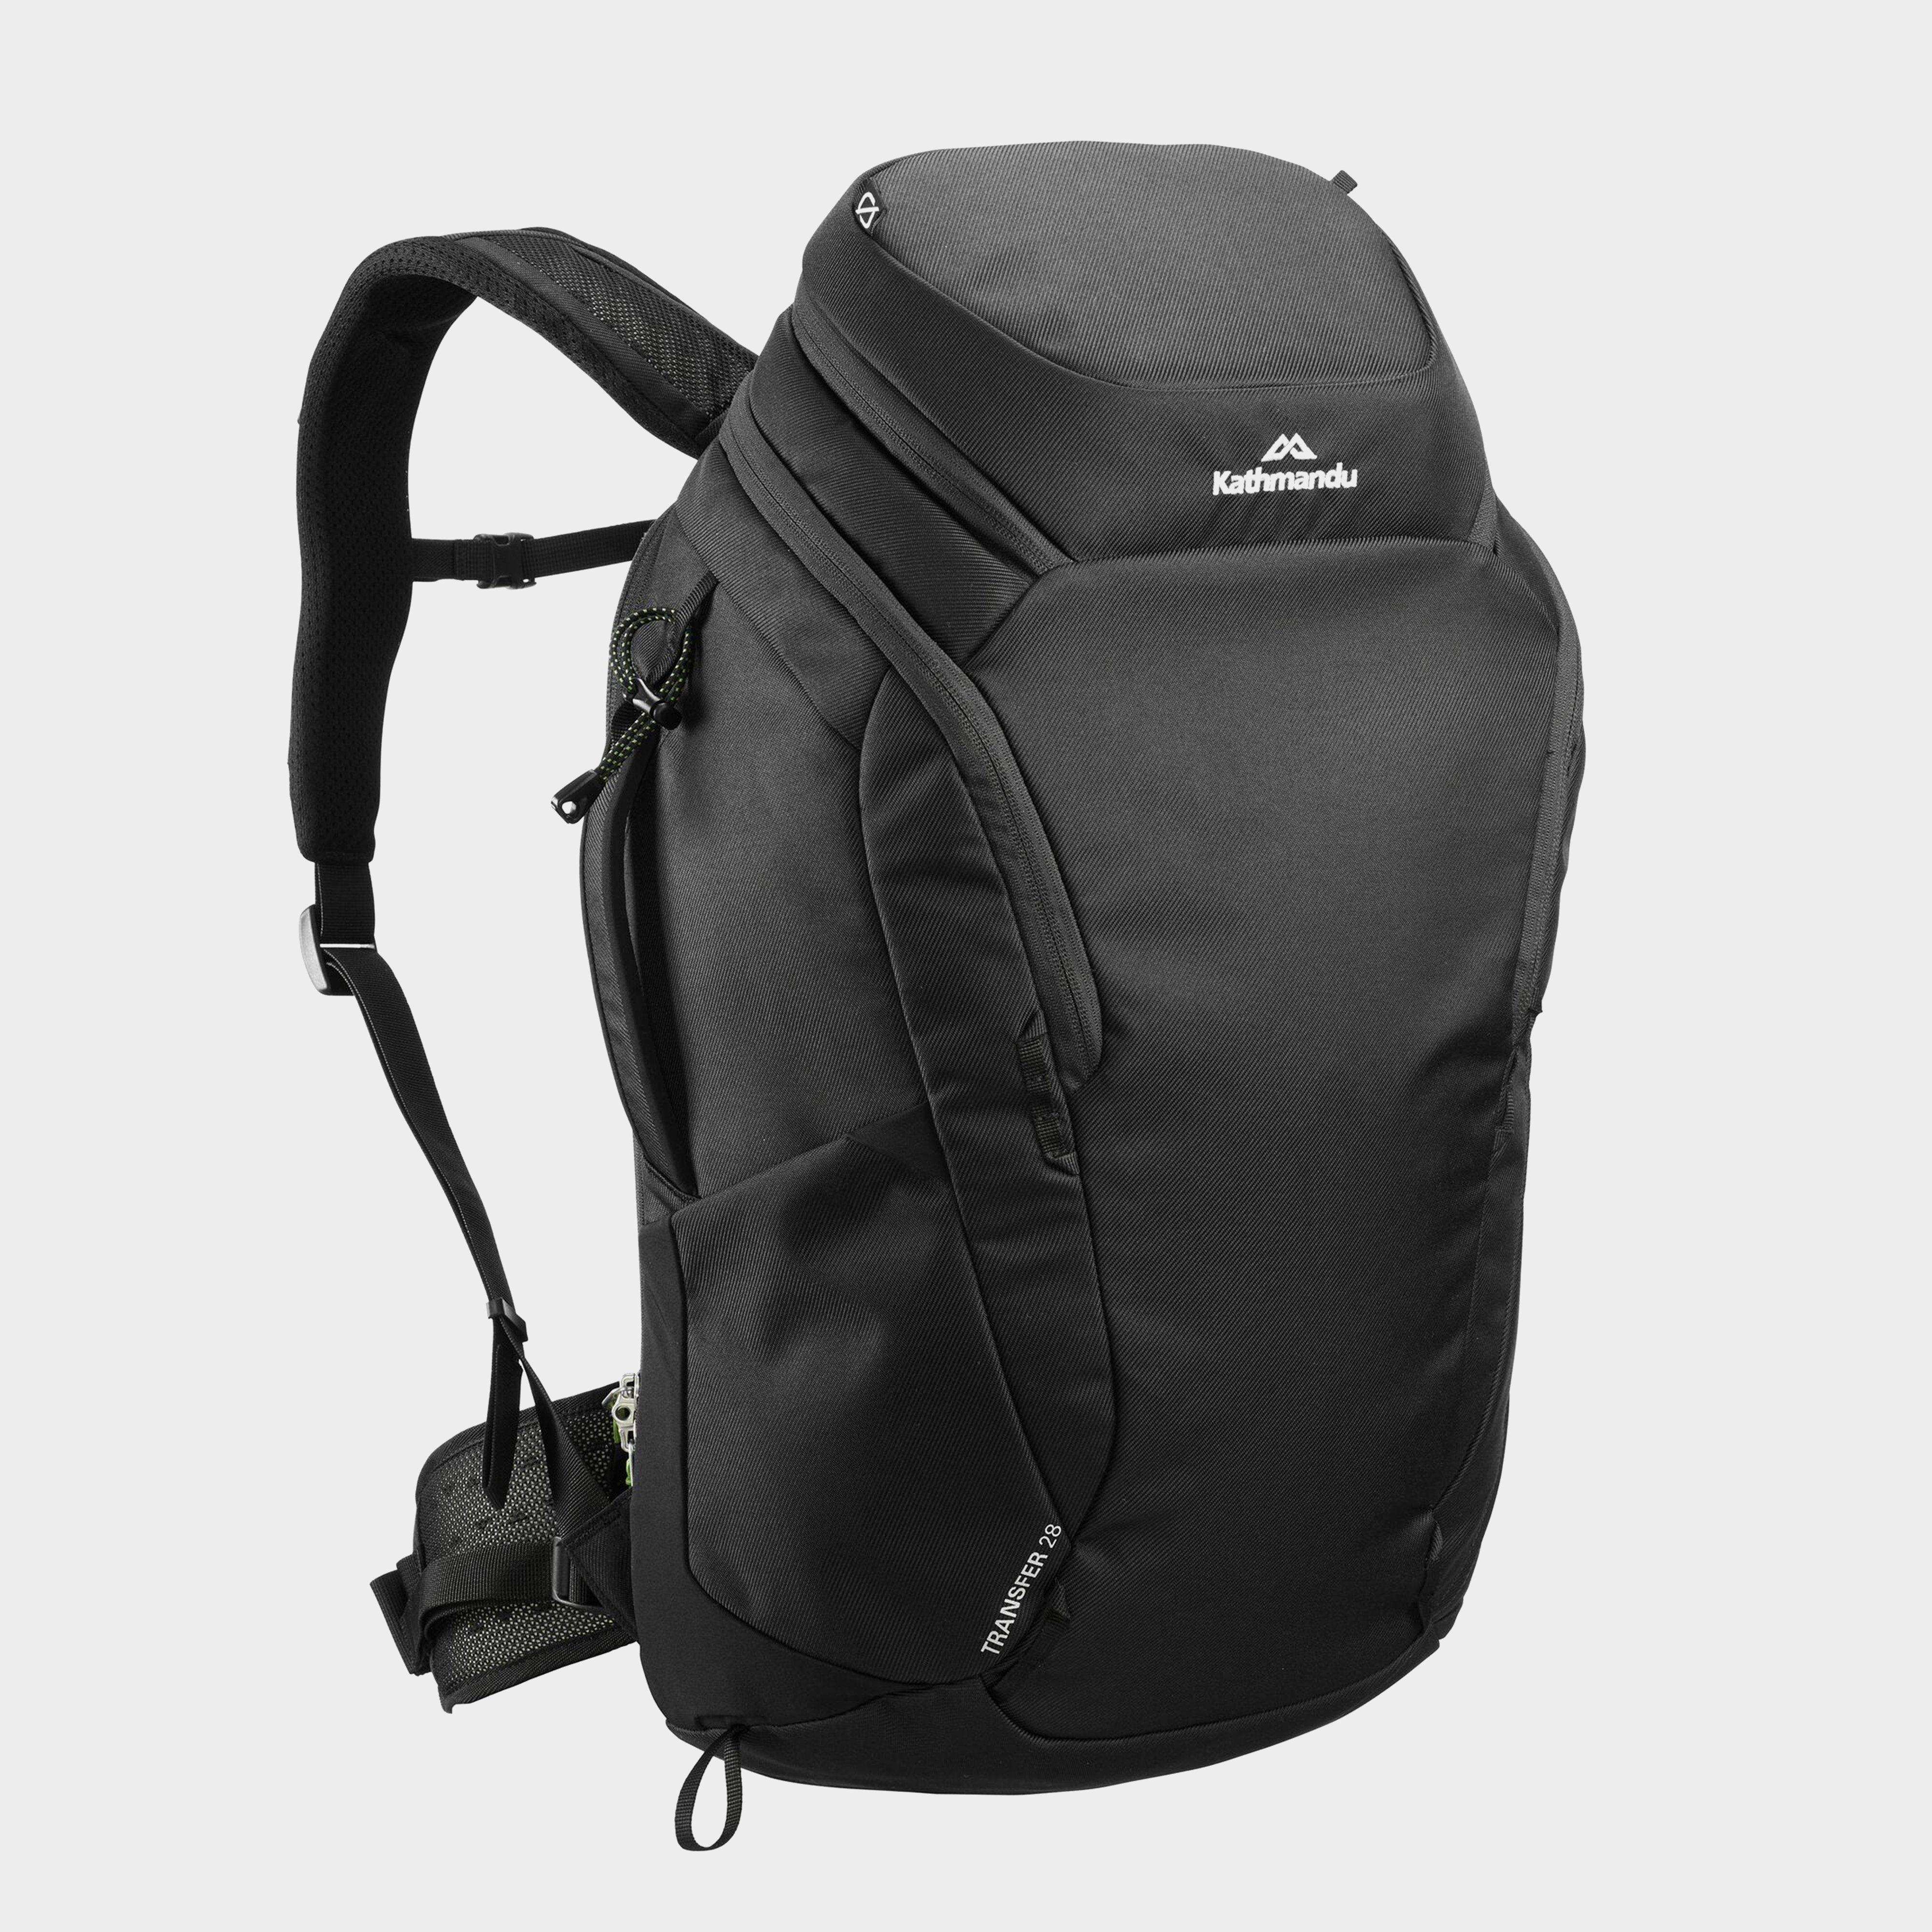 Kathmandu Transfer Pack 28L, Black